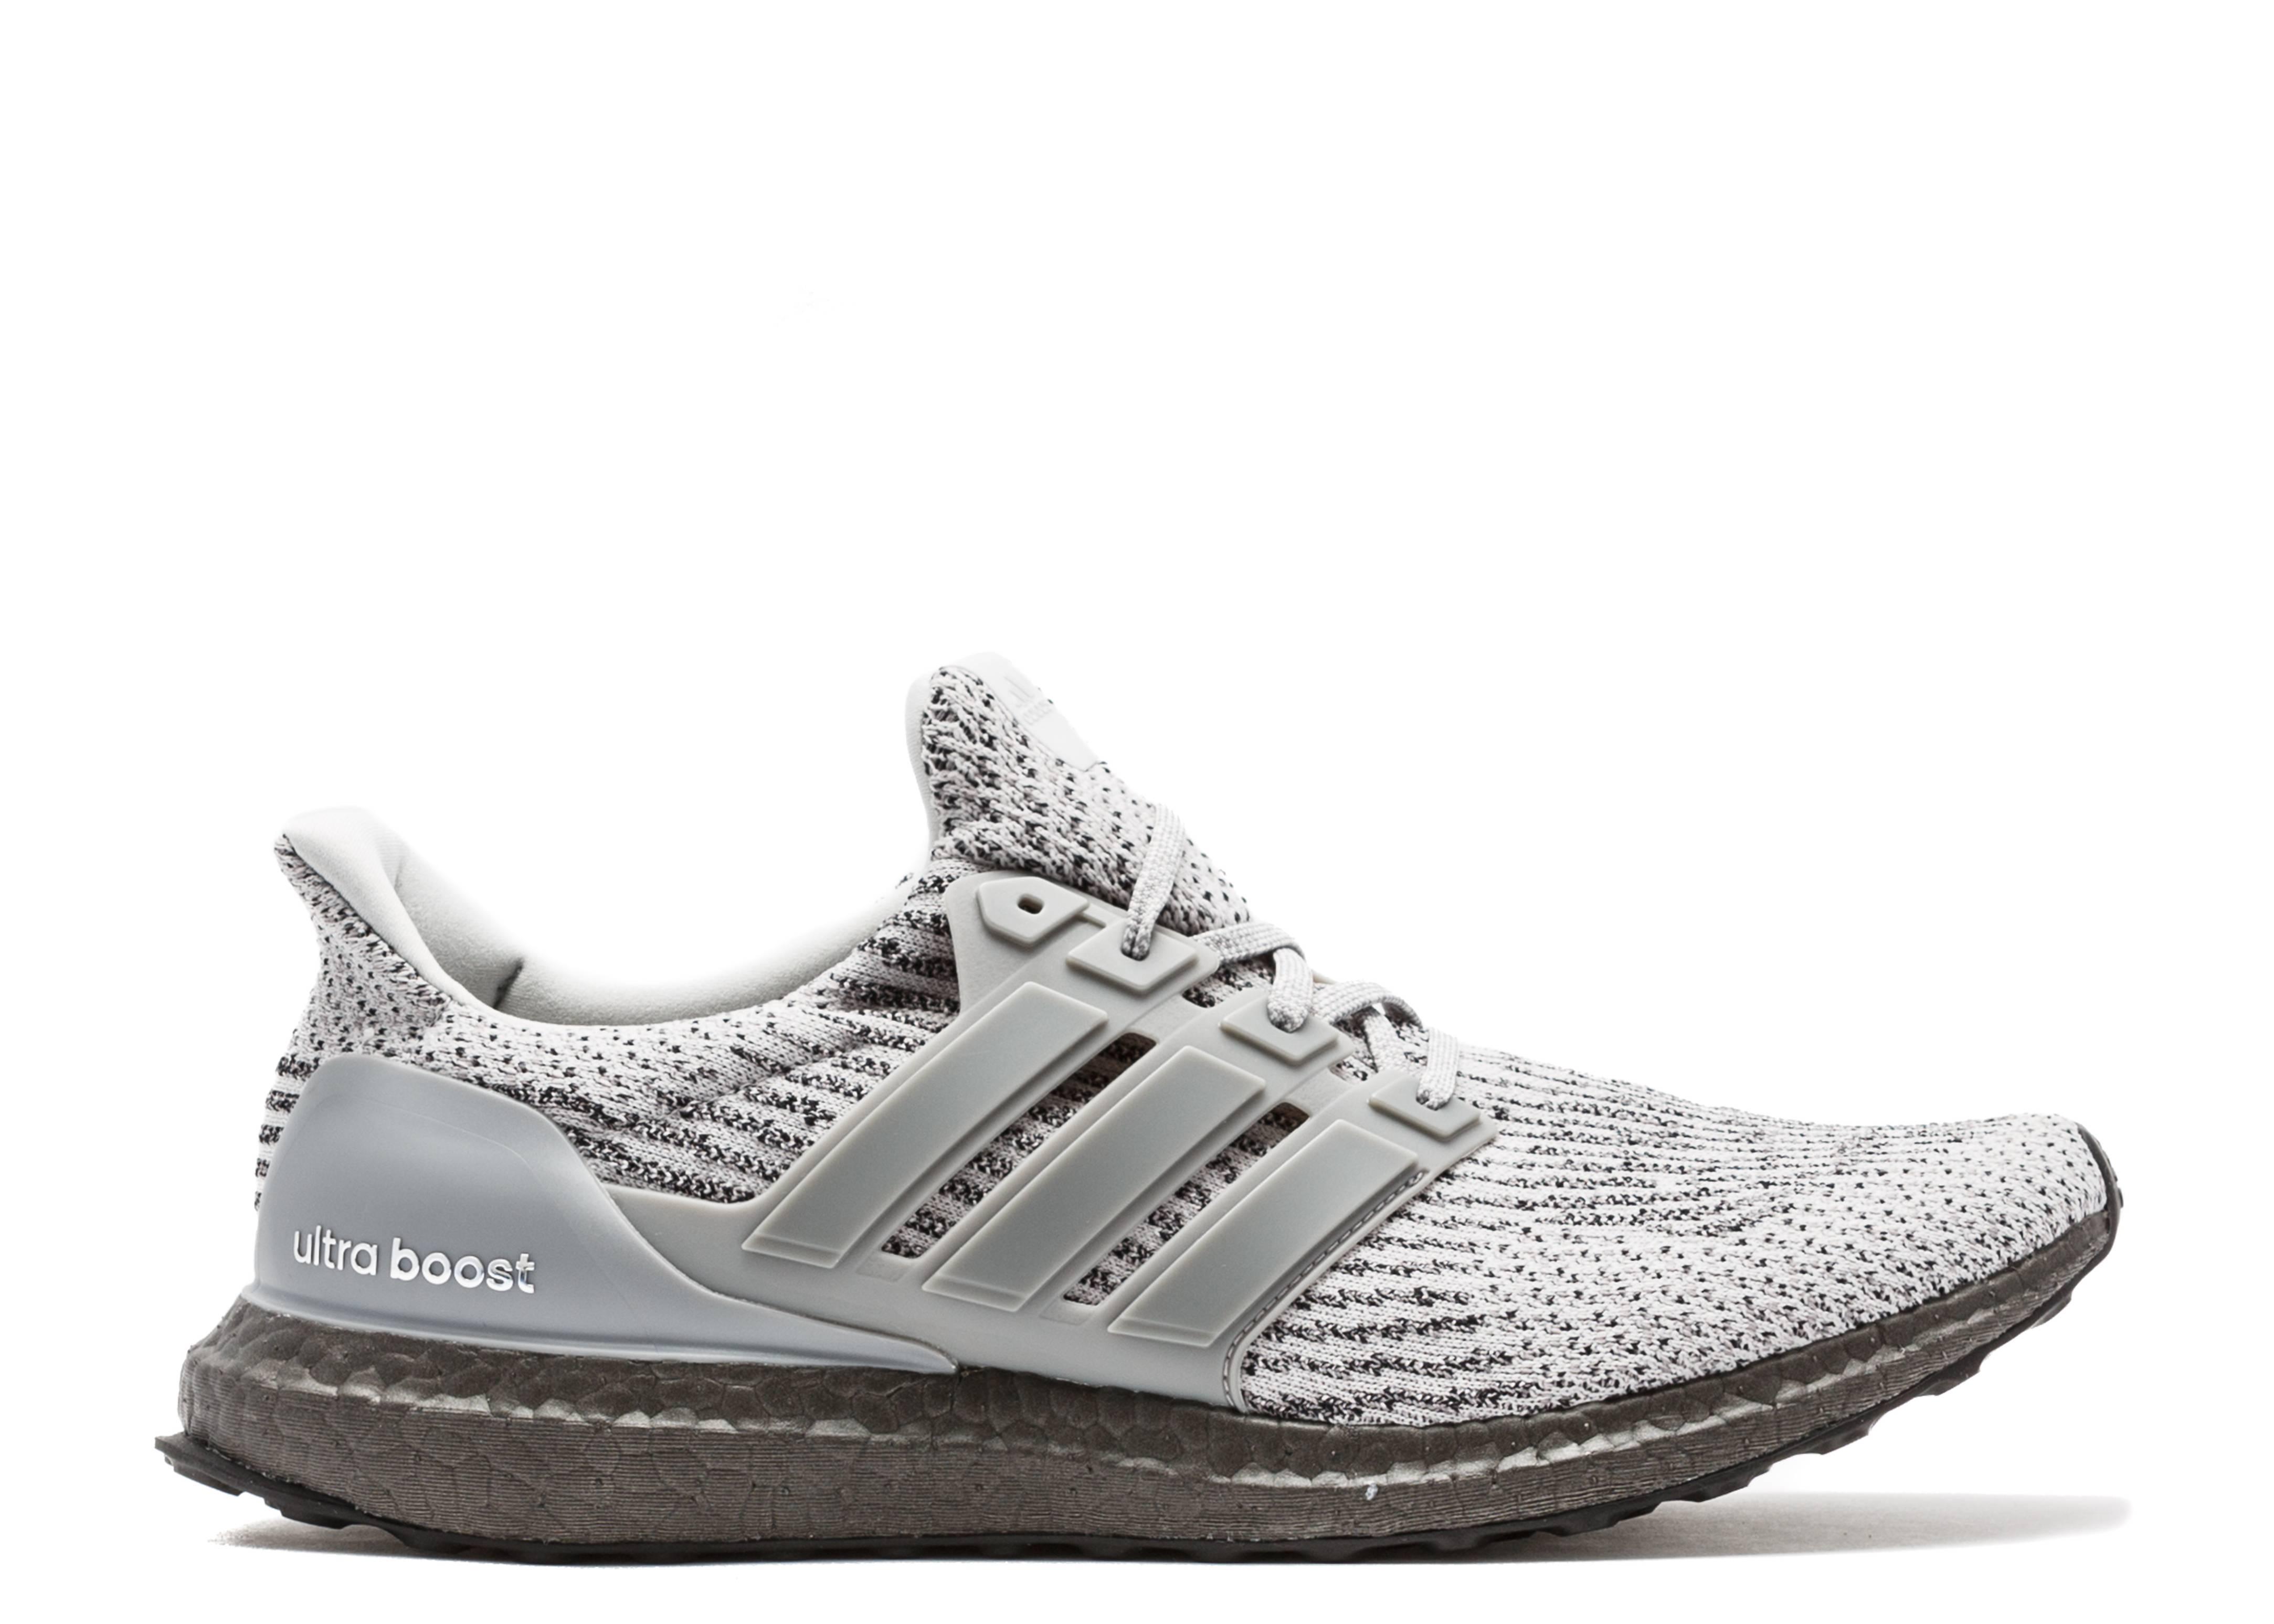 Adidas Ultra Boost 3.0 Xeno 47 13